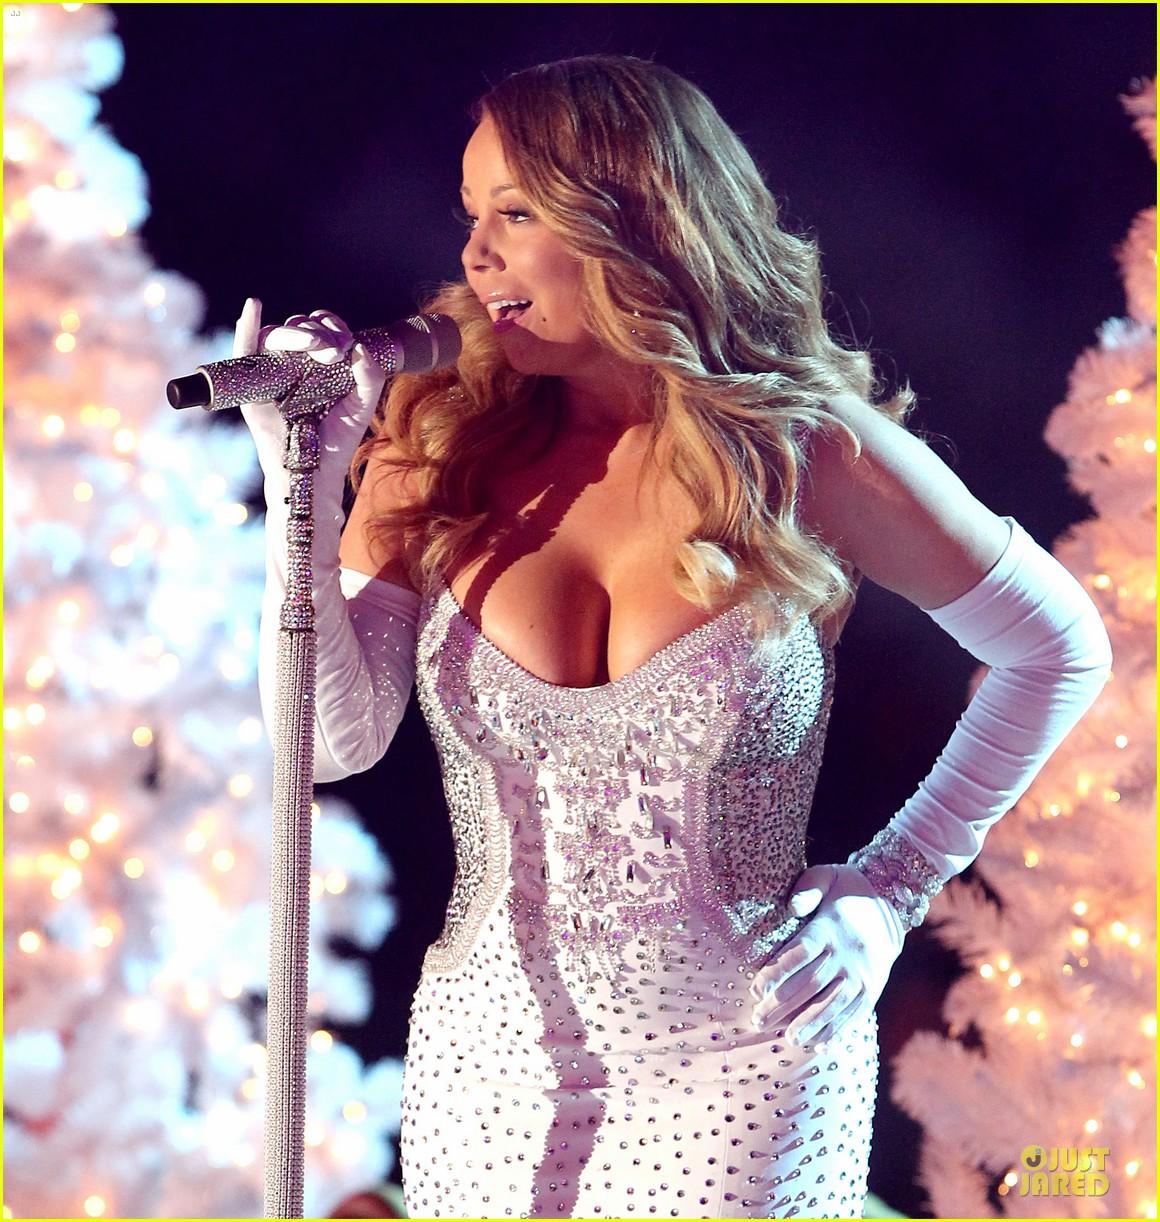 mariah carey rockfeller center christmas tree lighting 2013 performer 27